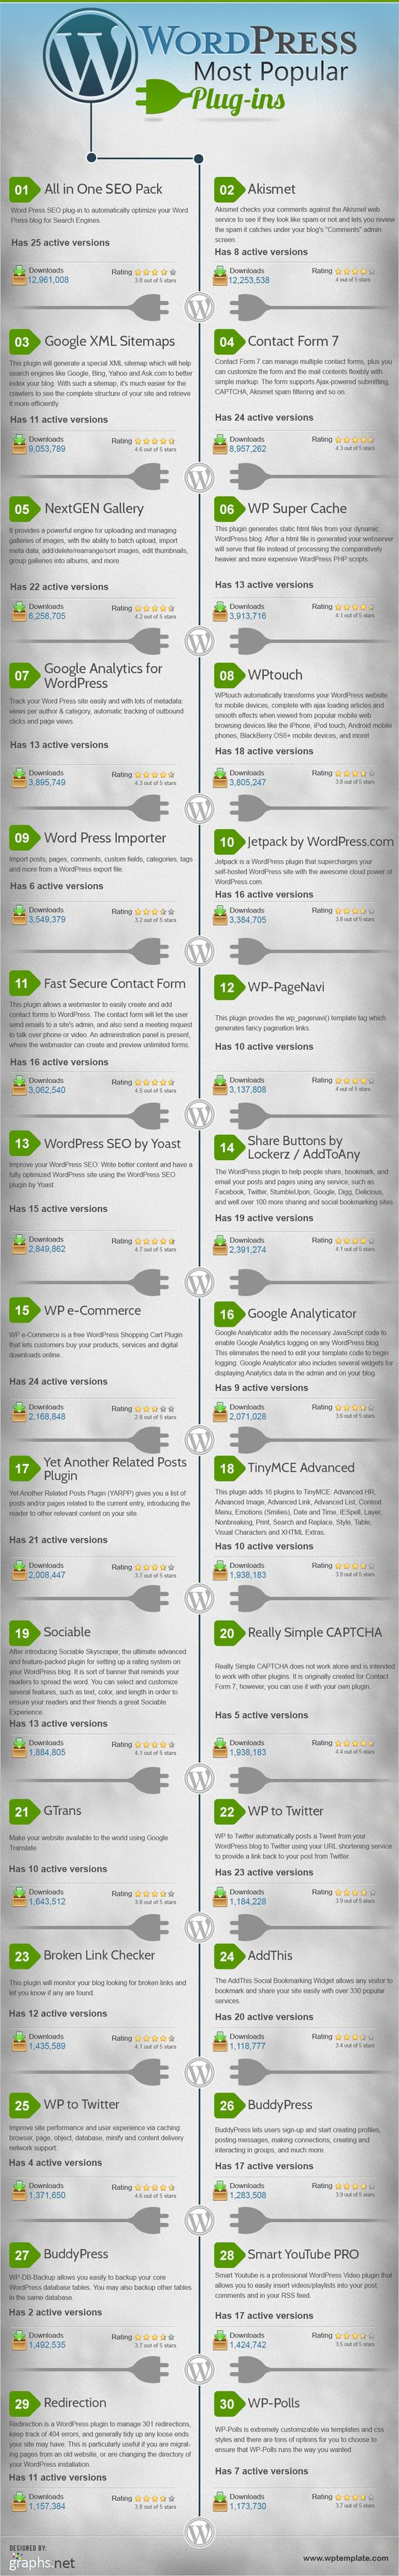 Most Popular WordPress Plugins [Infographic]